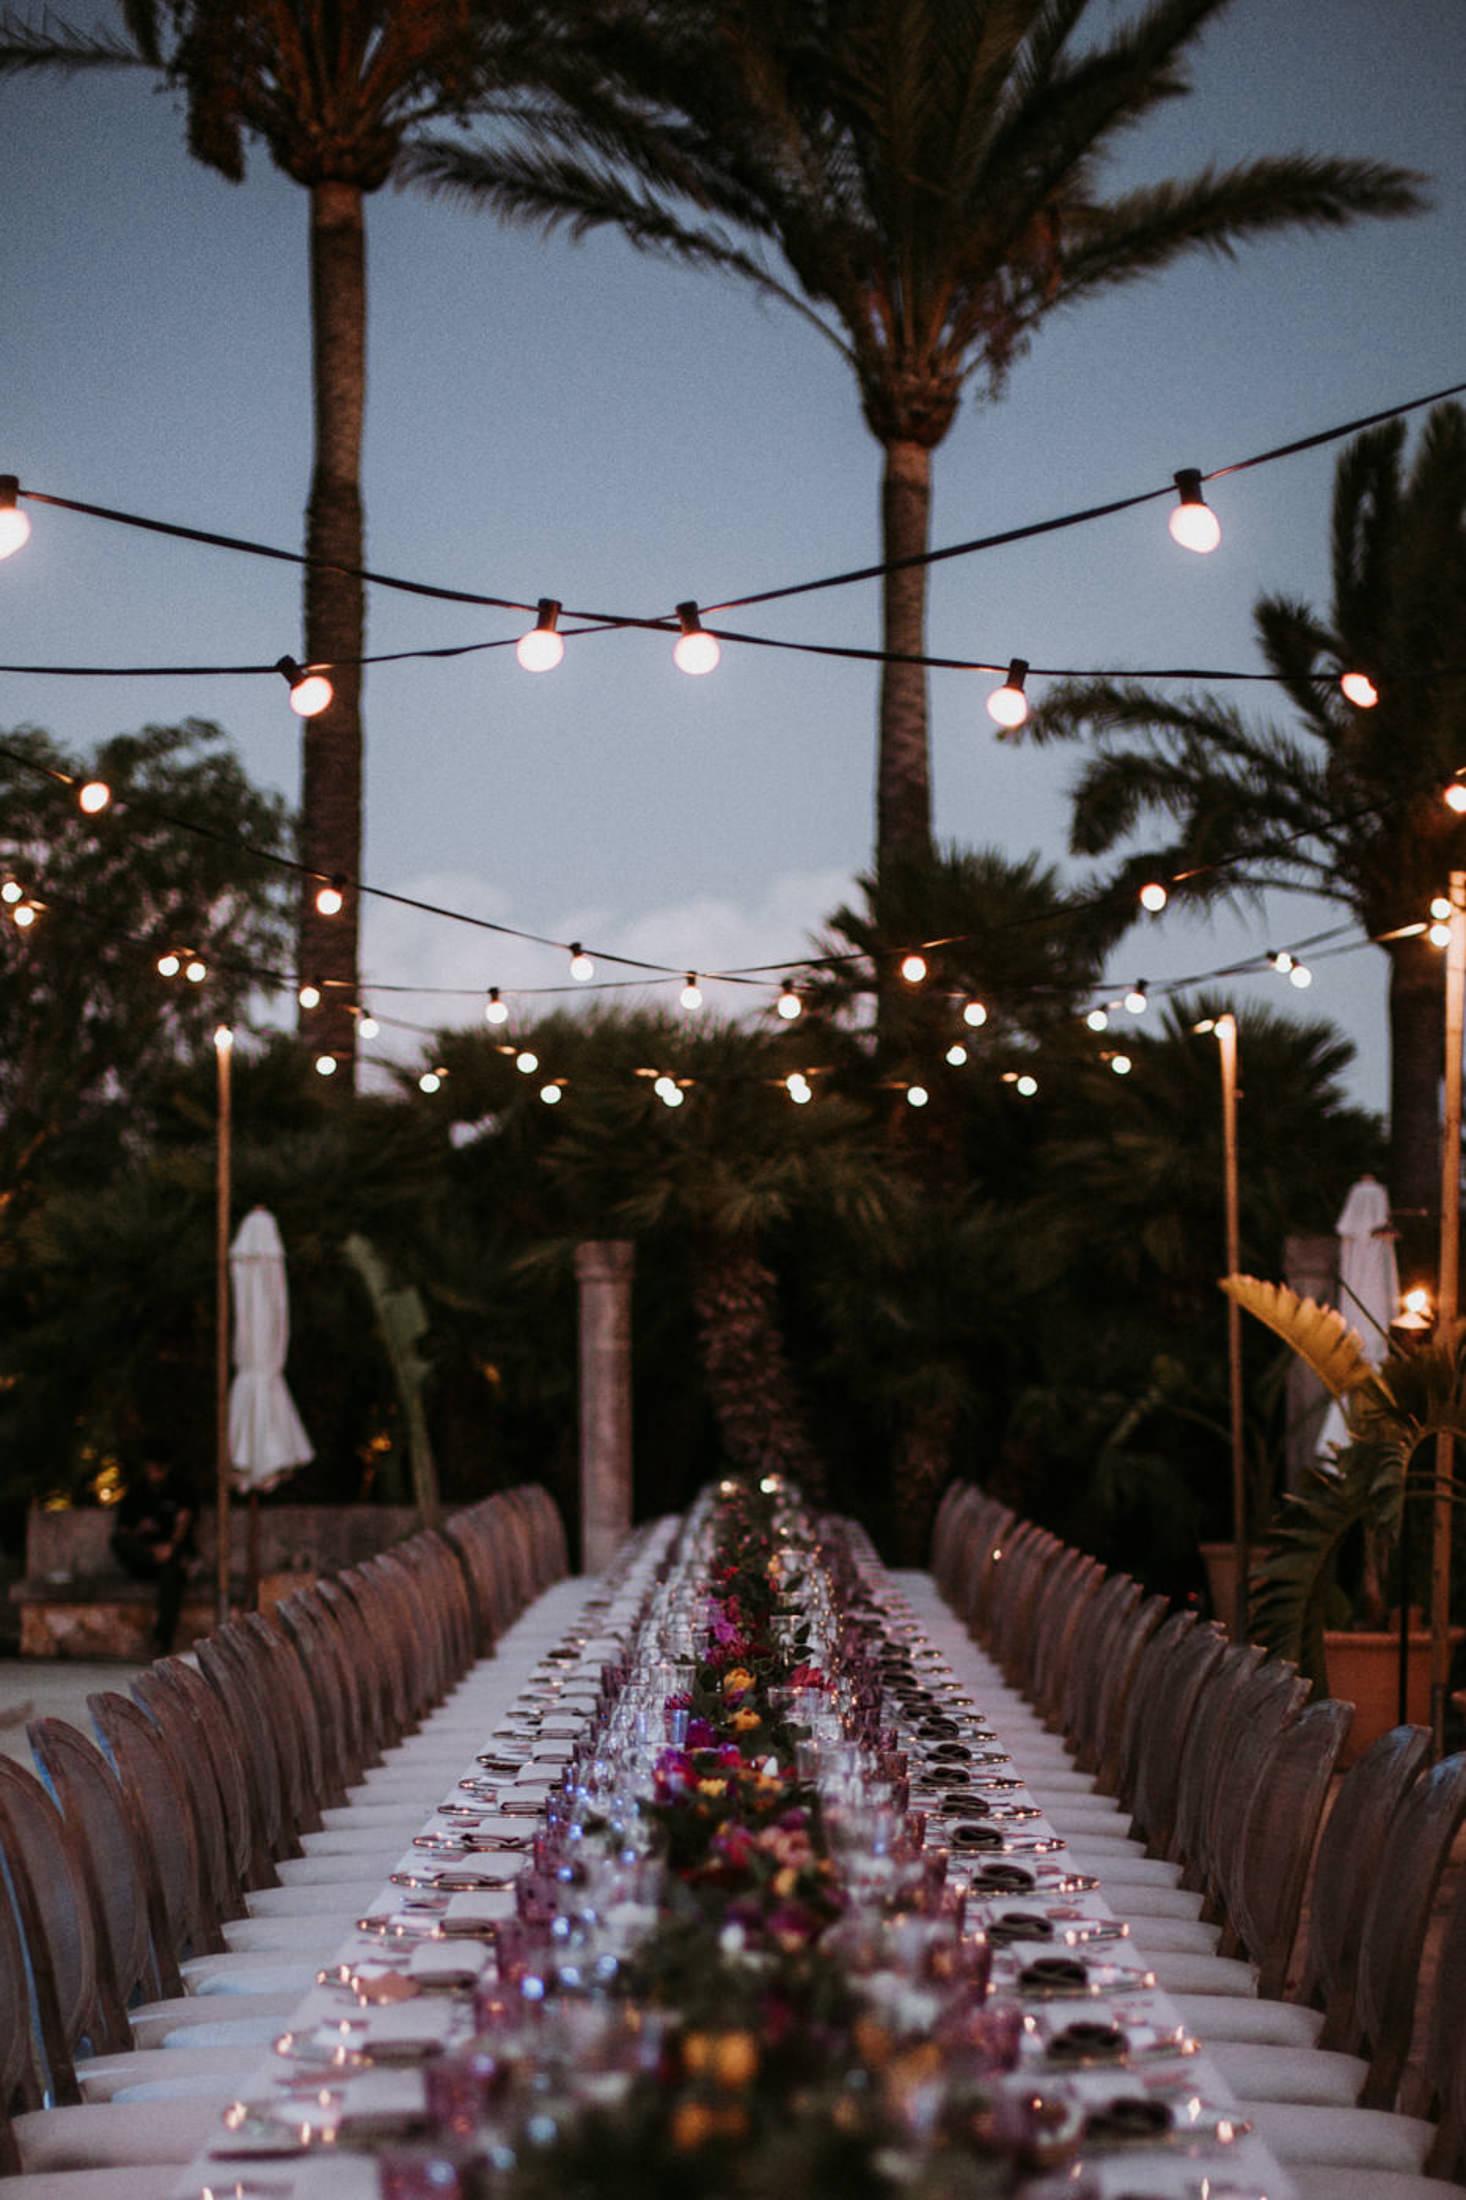 Wedding_Photographer_Mallorca_Daniela-Marquardt_Photography_New_York_Iceland_Tuscany_Santorini_Portugal_Austria_Bavaria_Elopement_Hochzeitsfotograf_AntjeRajat2_110